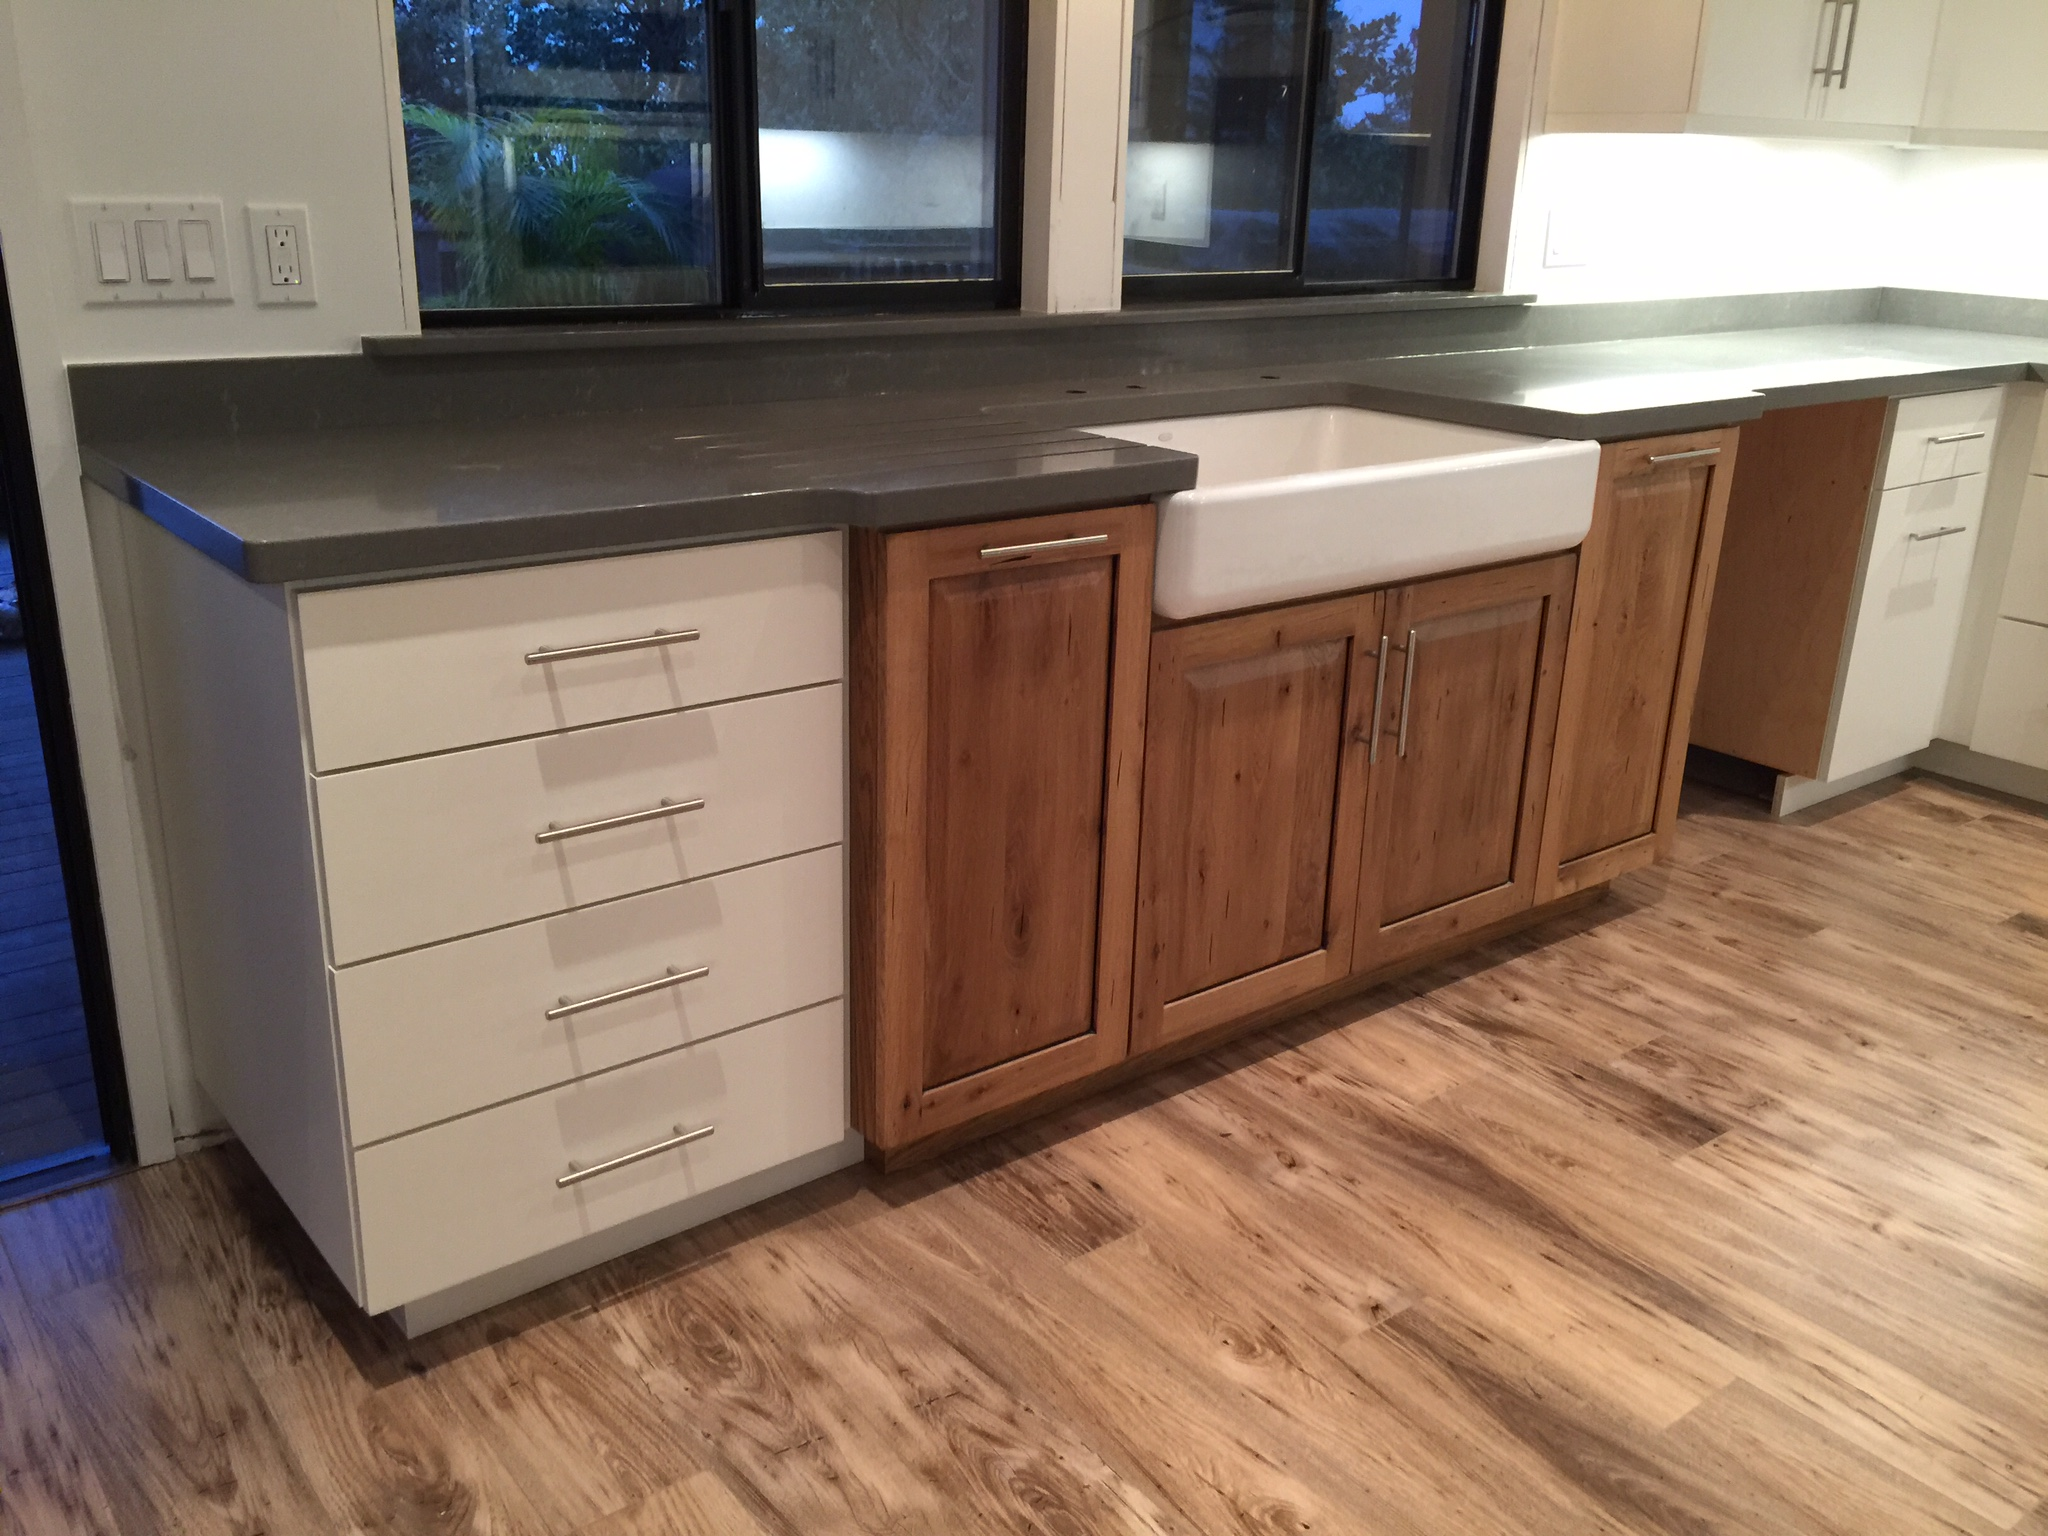 Flat Style | Decorators White Conversion Varnish Paint + Rustic White Oak | Raised Panel | Clear Fin